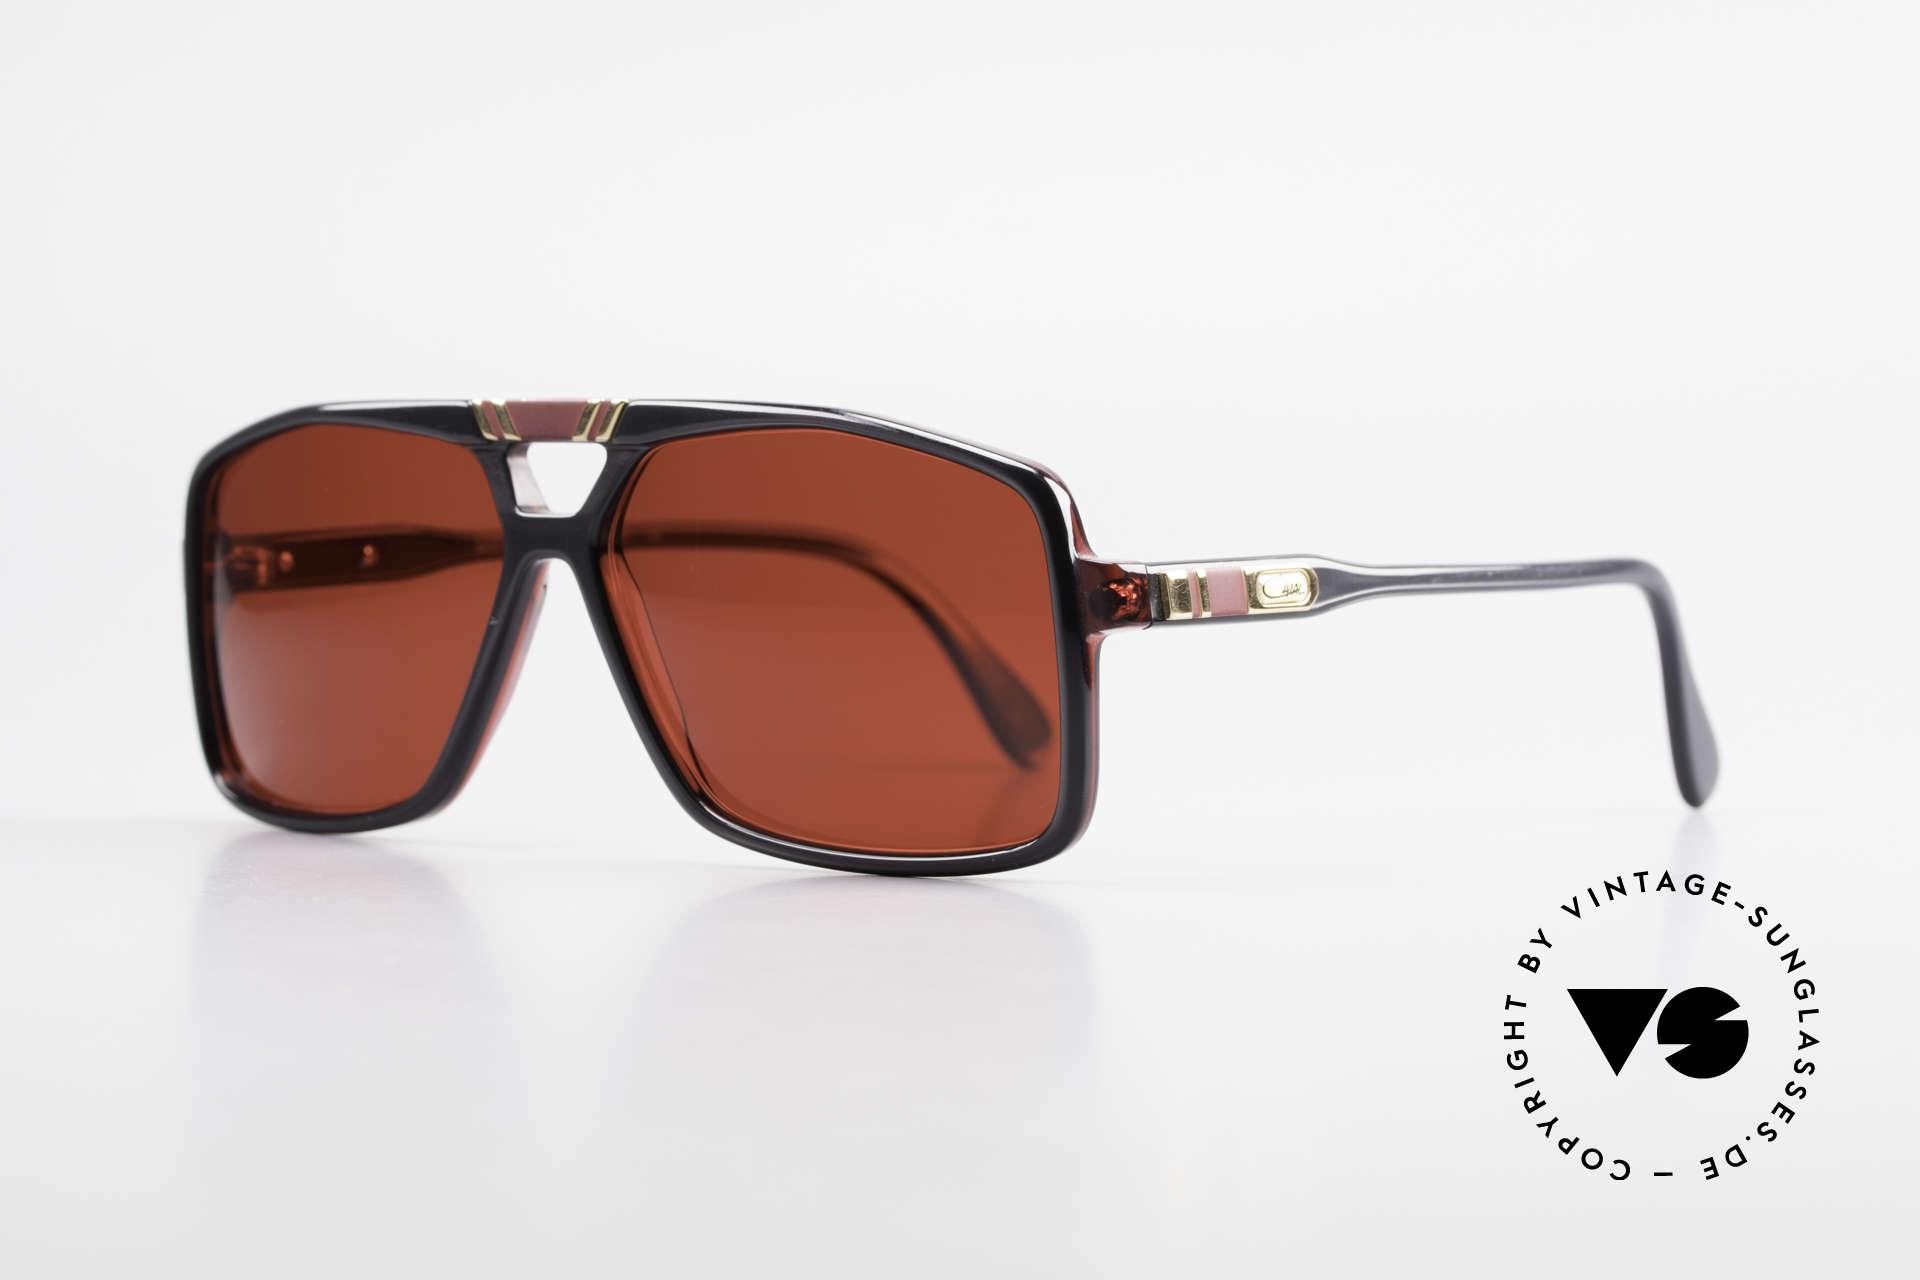 Cazal 637 80er Cazal Sonnenbrille 3D Rot, fester Bestandteil der amerik. Hip-Hop-Szene, Passend für Herren